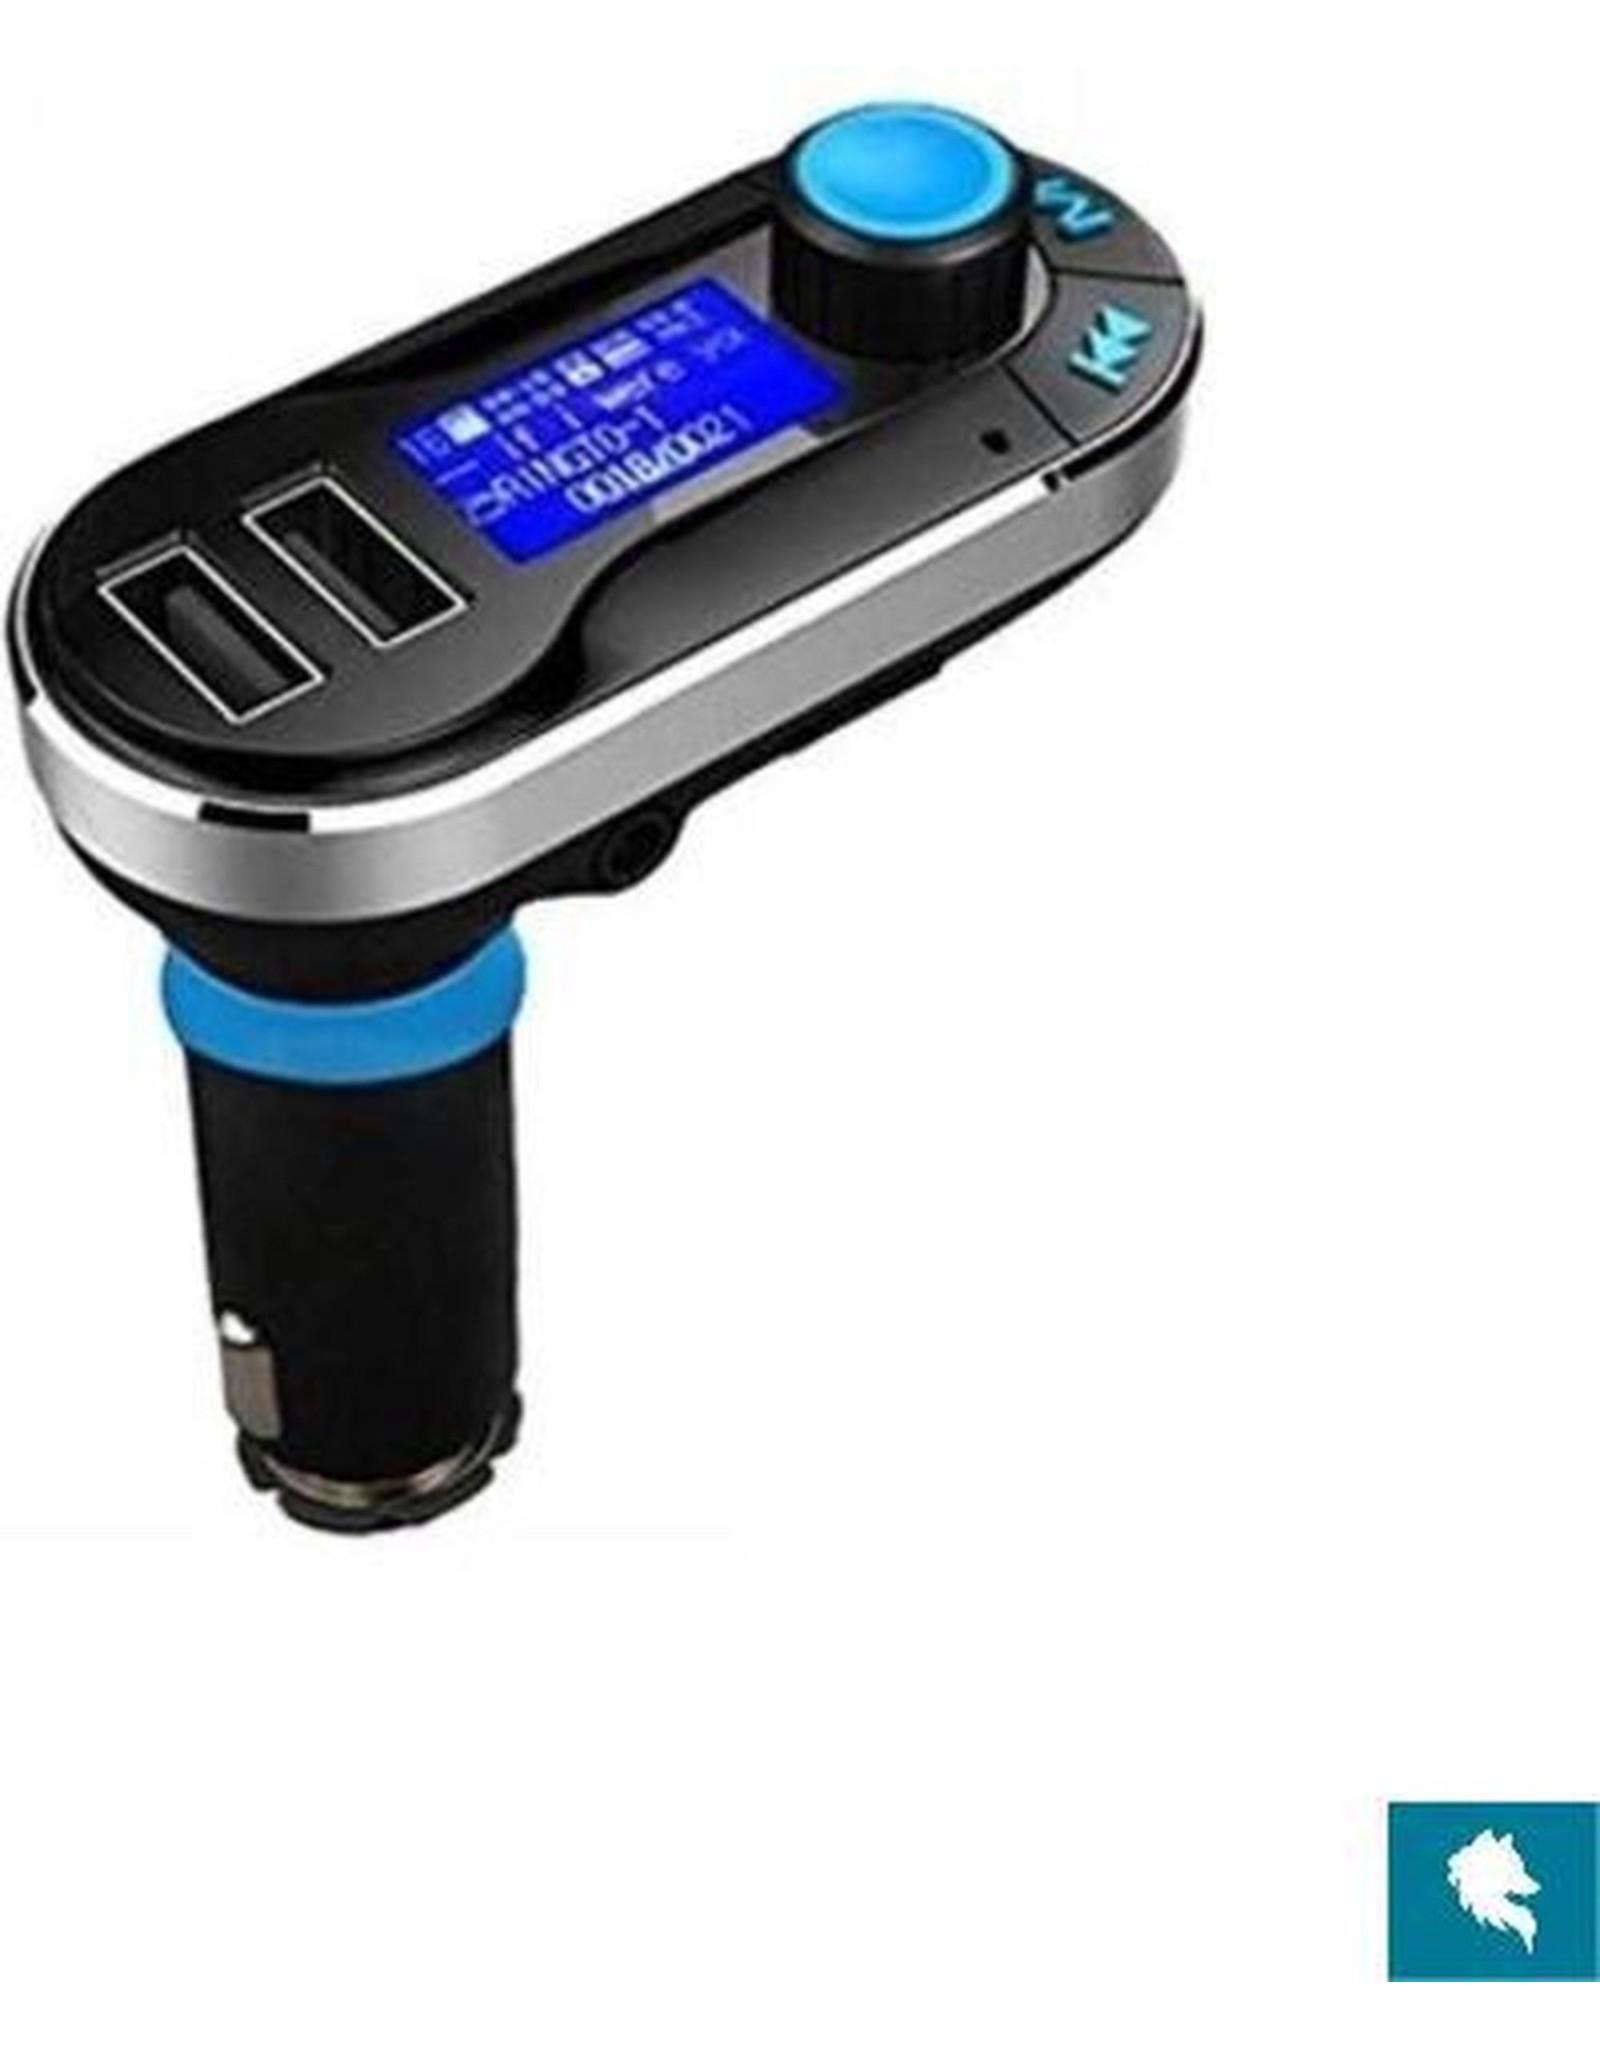 Parya Official Parya- 5 in 1 Carkit - Bluetooth